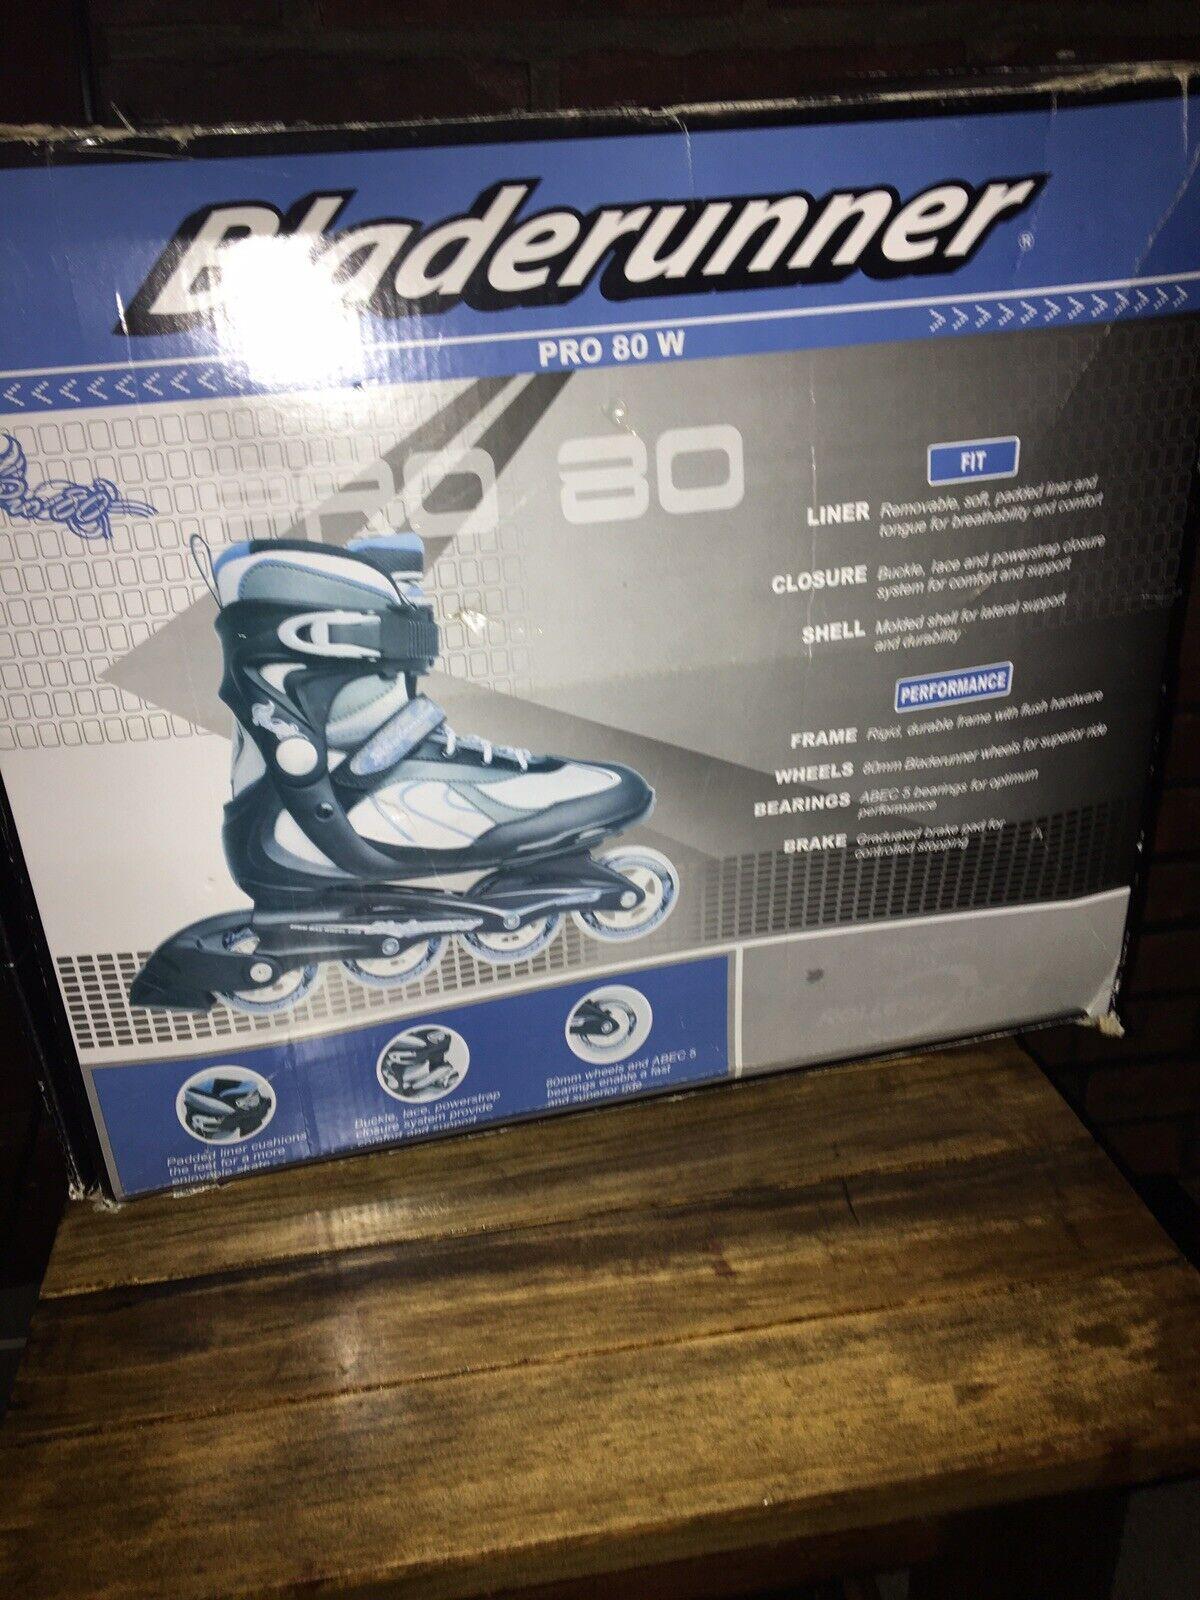 Brand New Bladerunner Rollerblades Pro 80 For Men